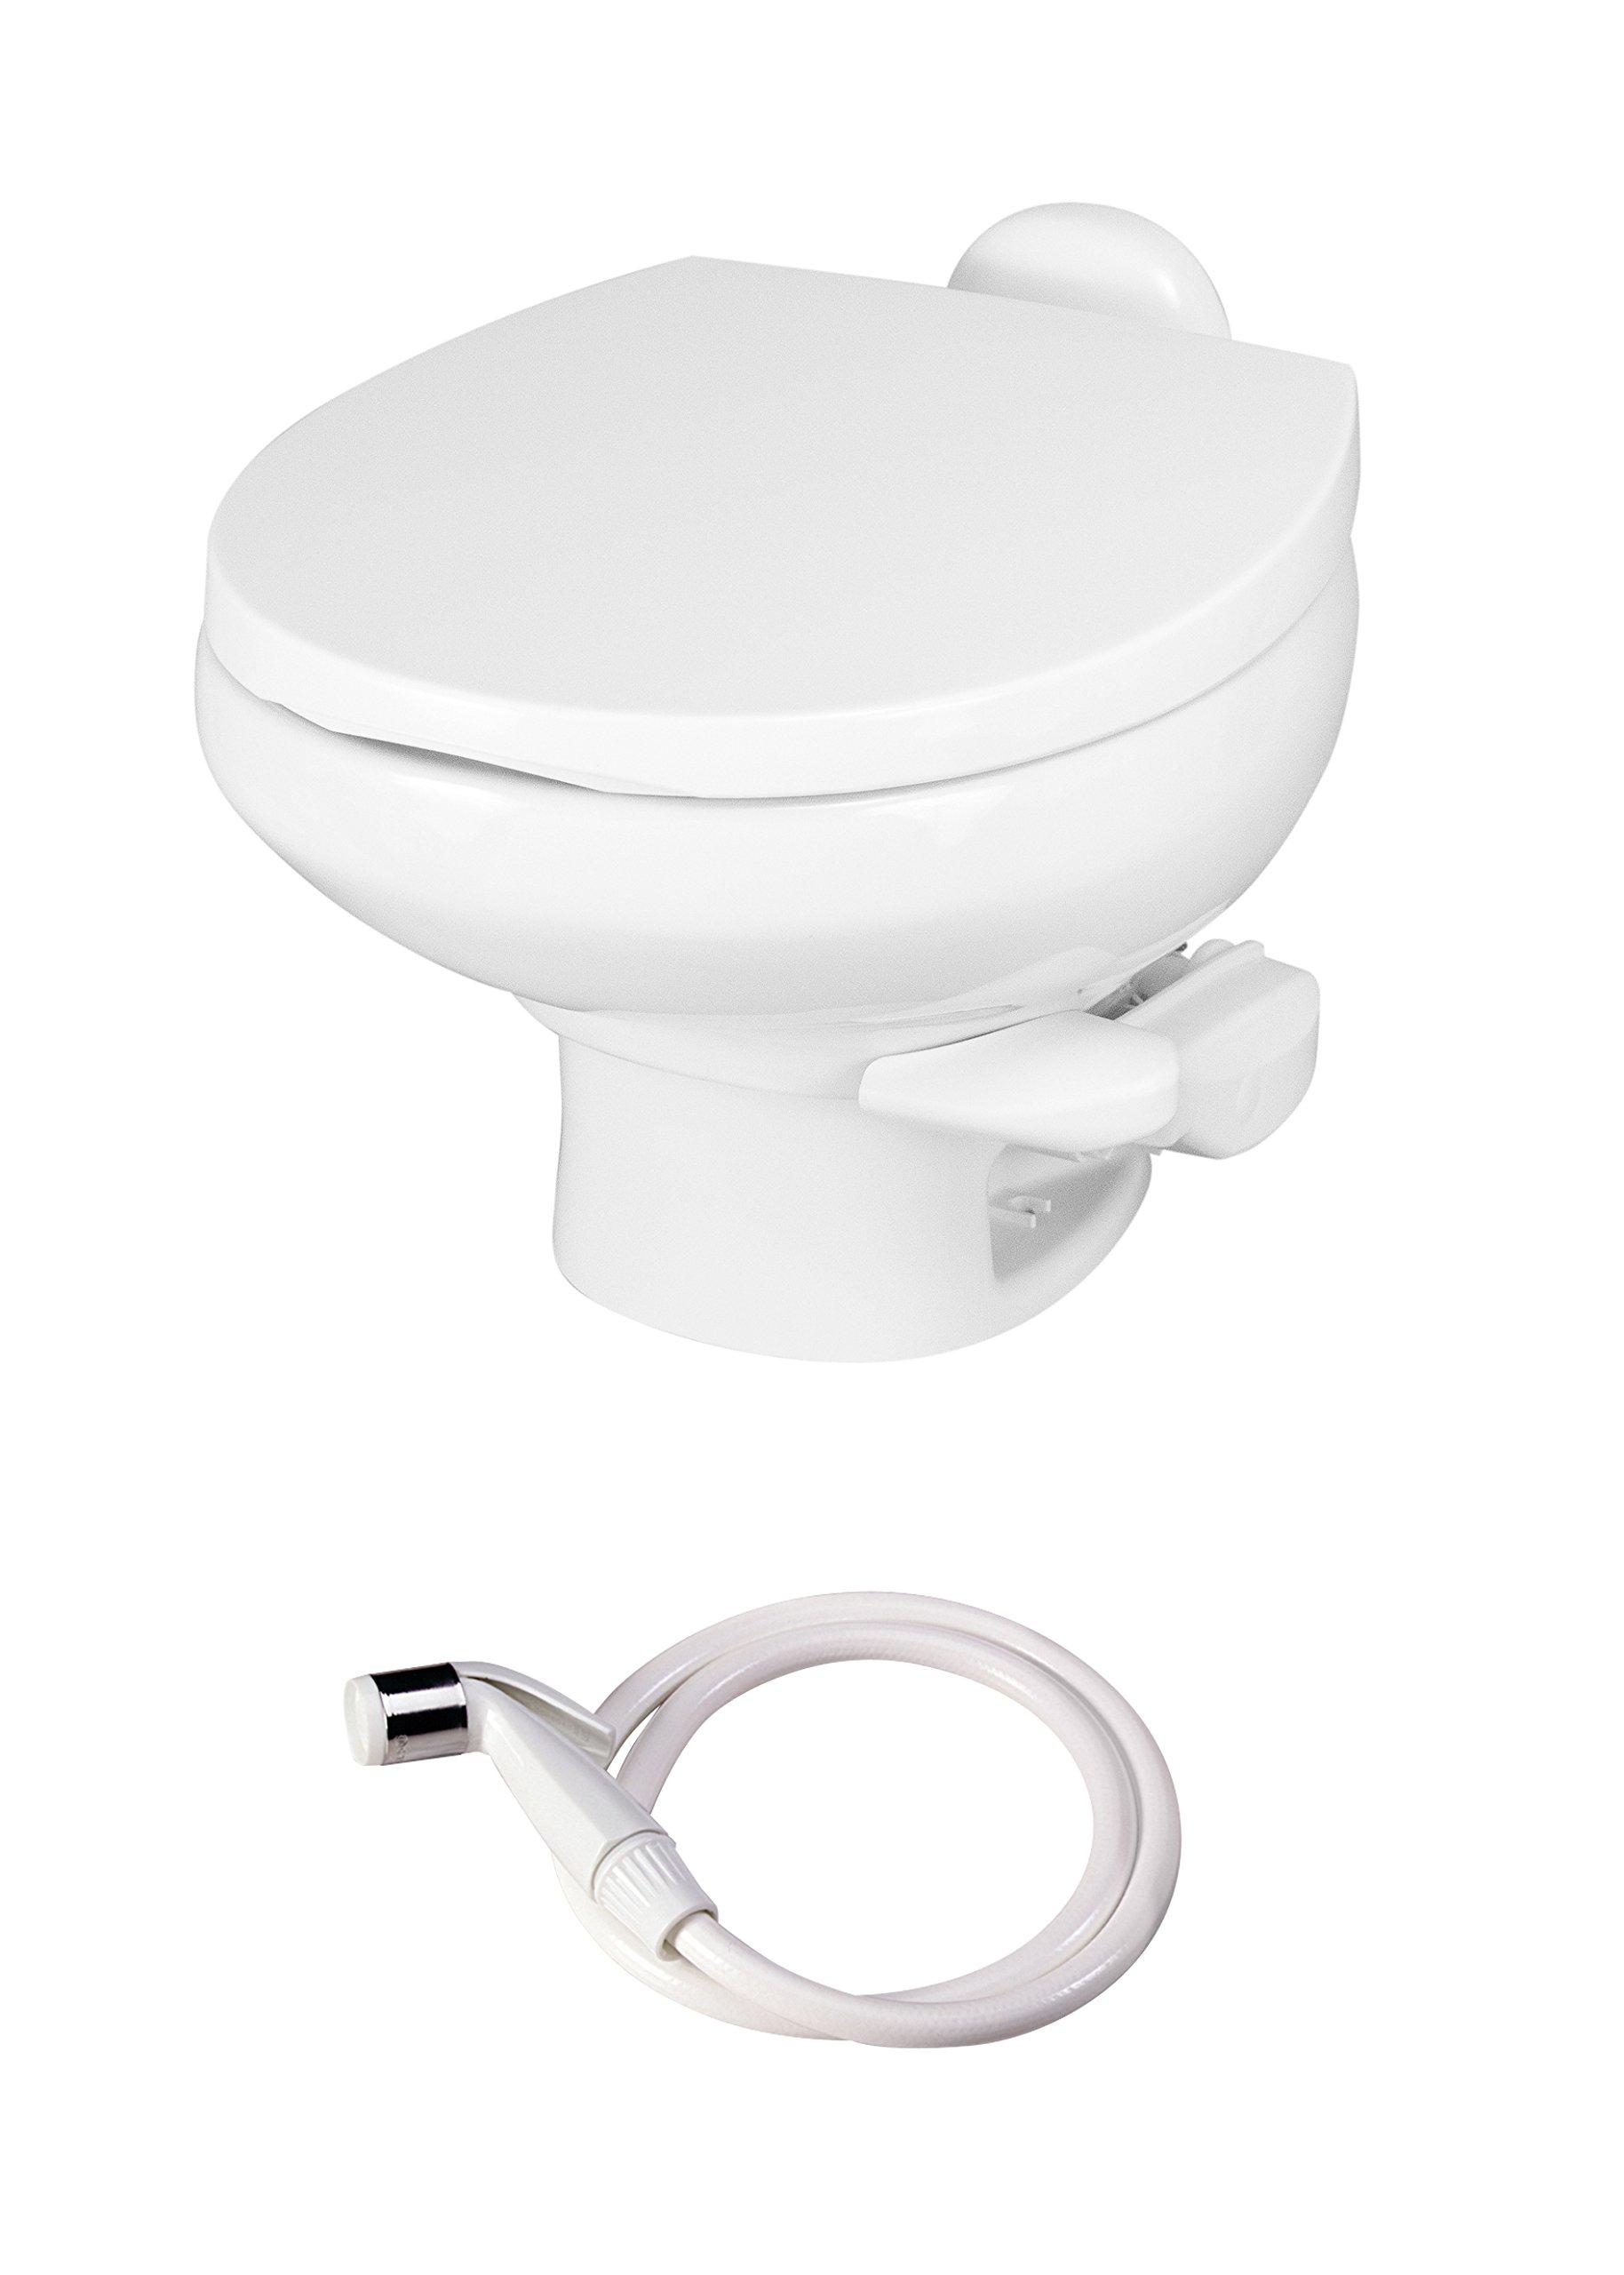 Aqua Magic Style II RV Toilet